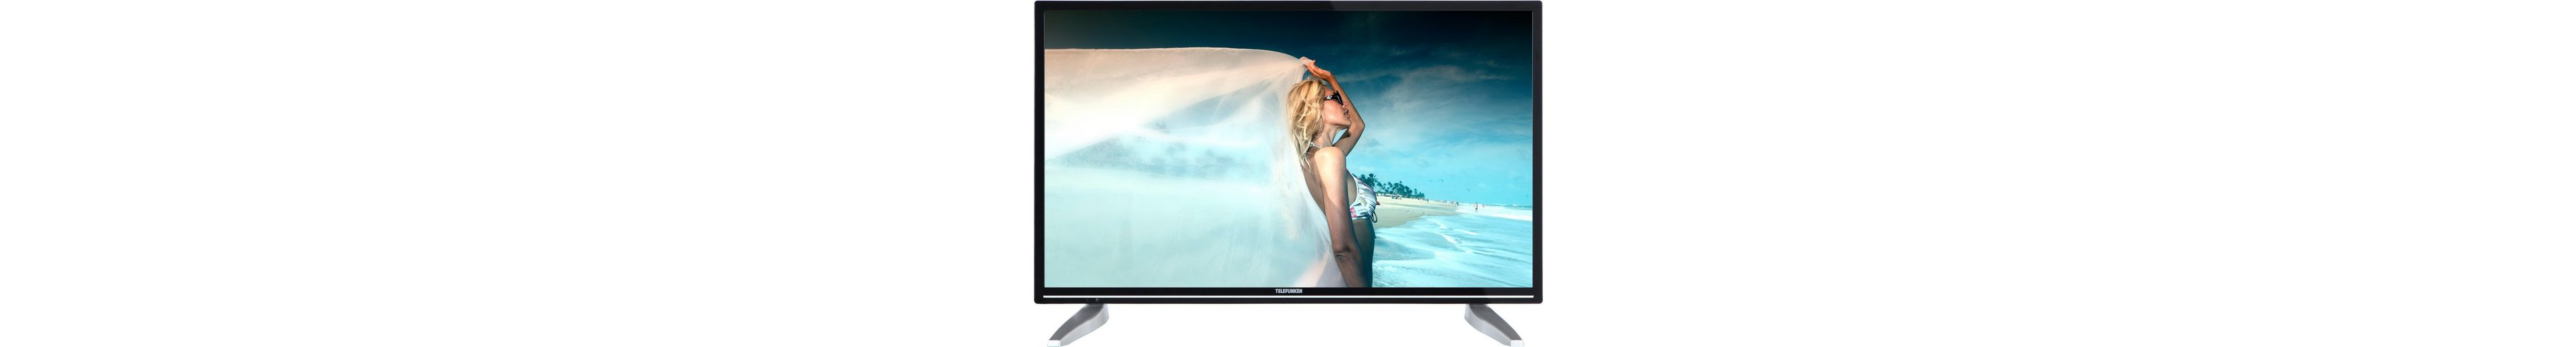 Telefunken D32F286X3, LED Fernseher, 81 cm (32 Zoll), 1080p (Full HD)